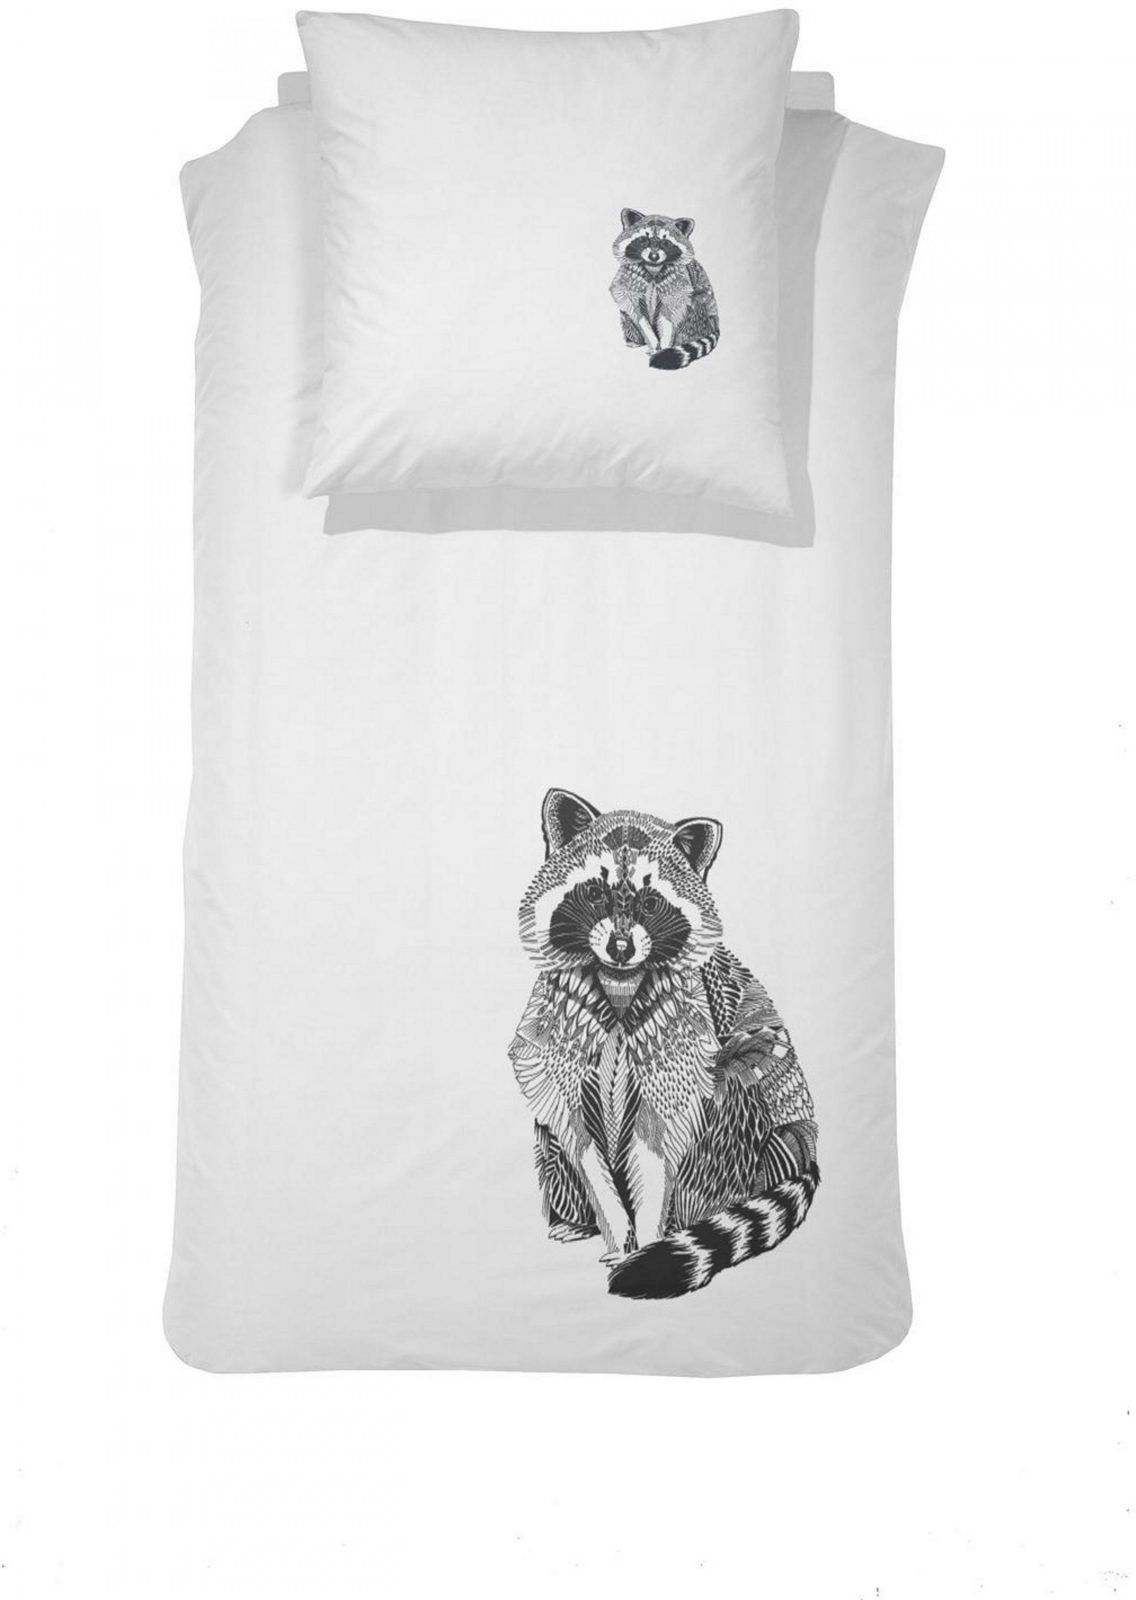 Bettwäsche Damai Raccoon Mit Tiermotiv Bestellen  Baur von Bettwäsche Mit Tiermotiven Photo